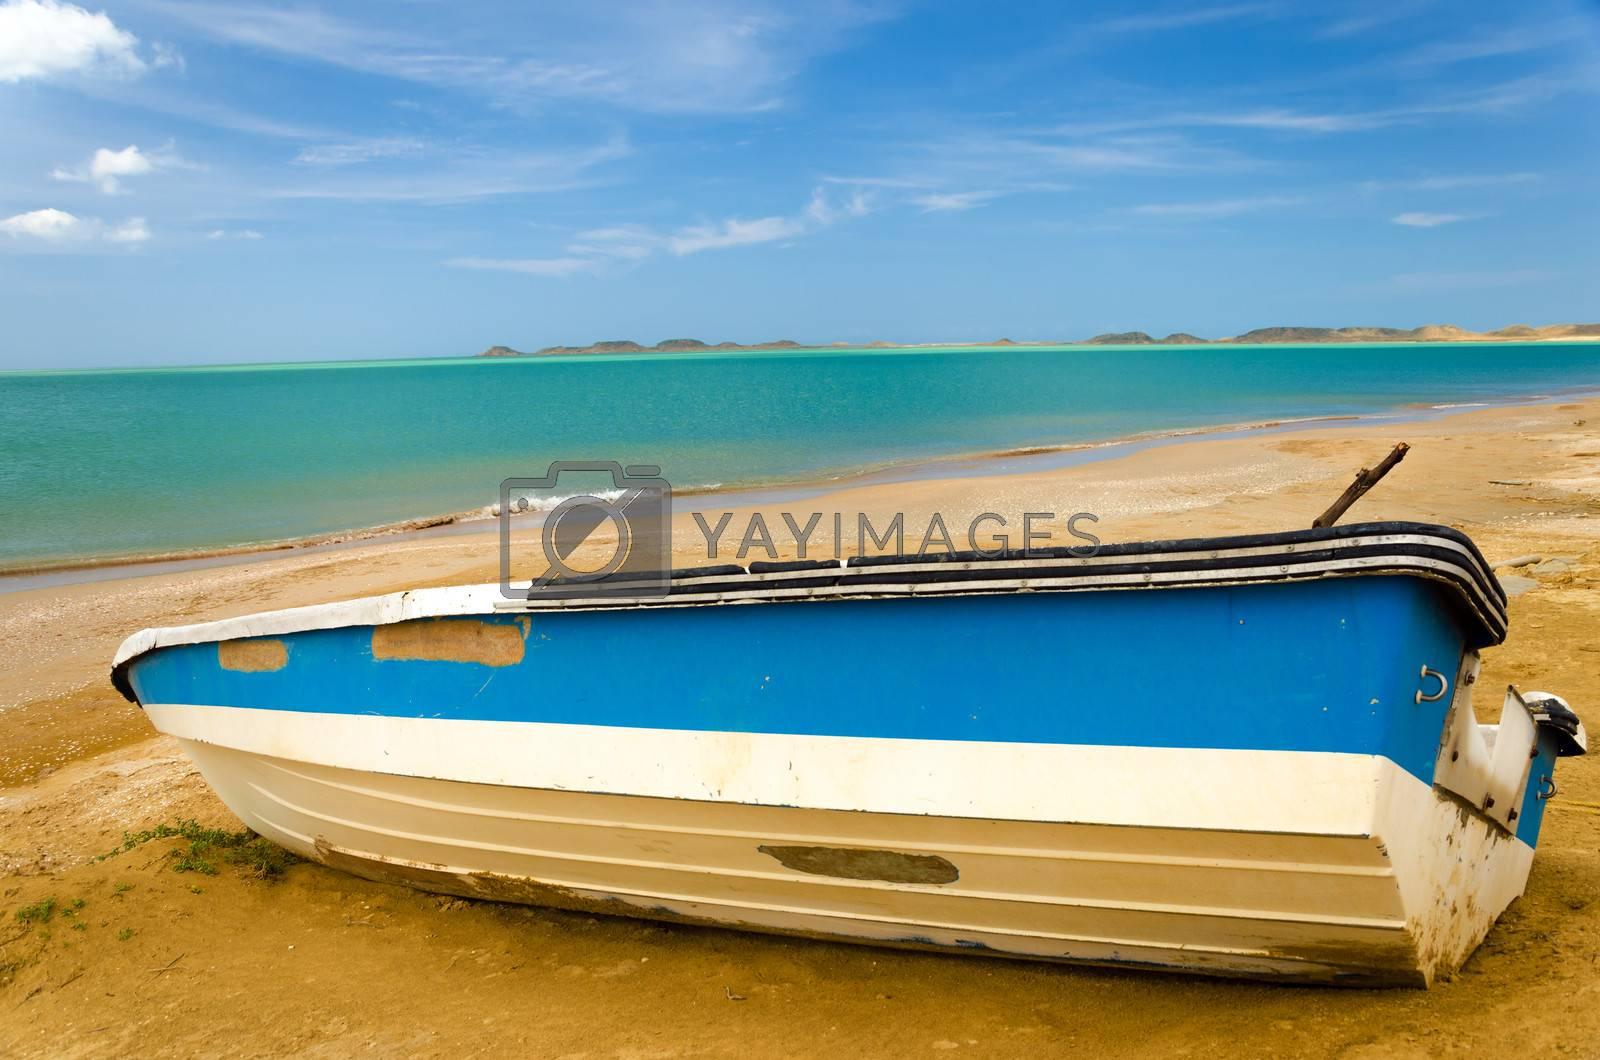 Blue and white boat on a Caribbean beach in La Guajira, Colombia